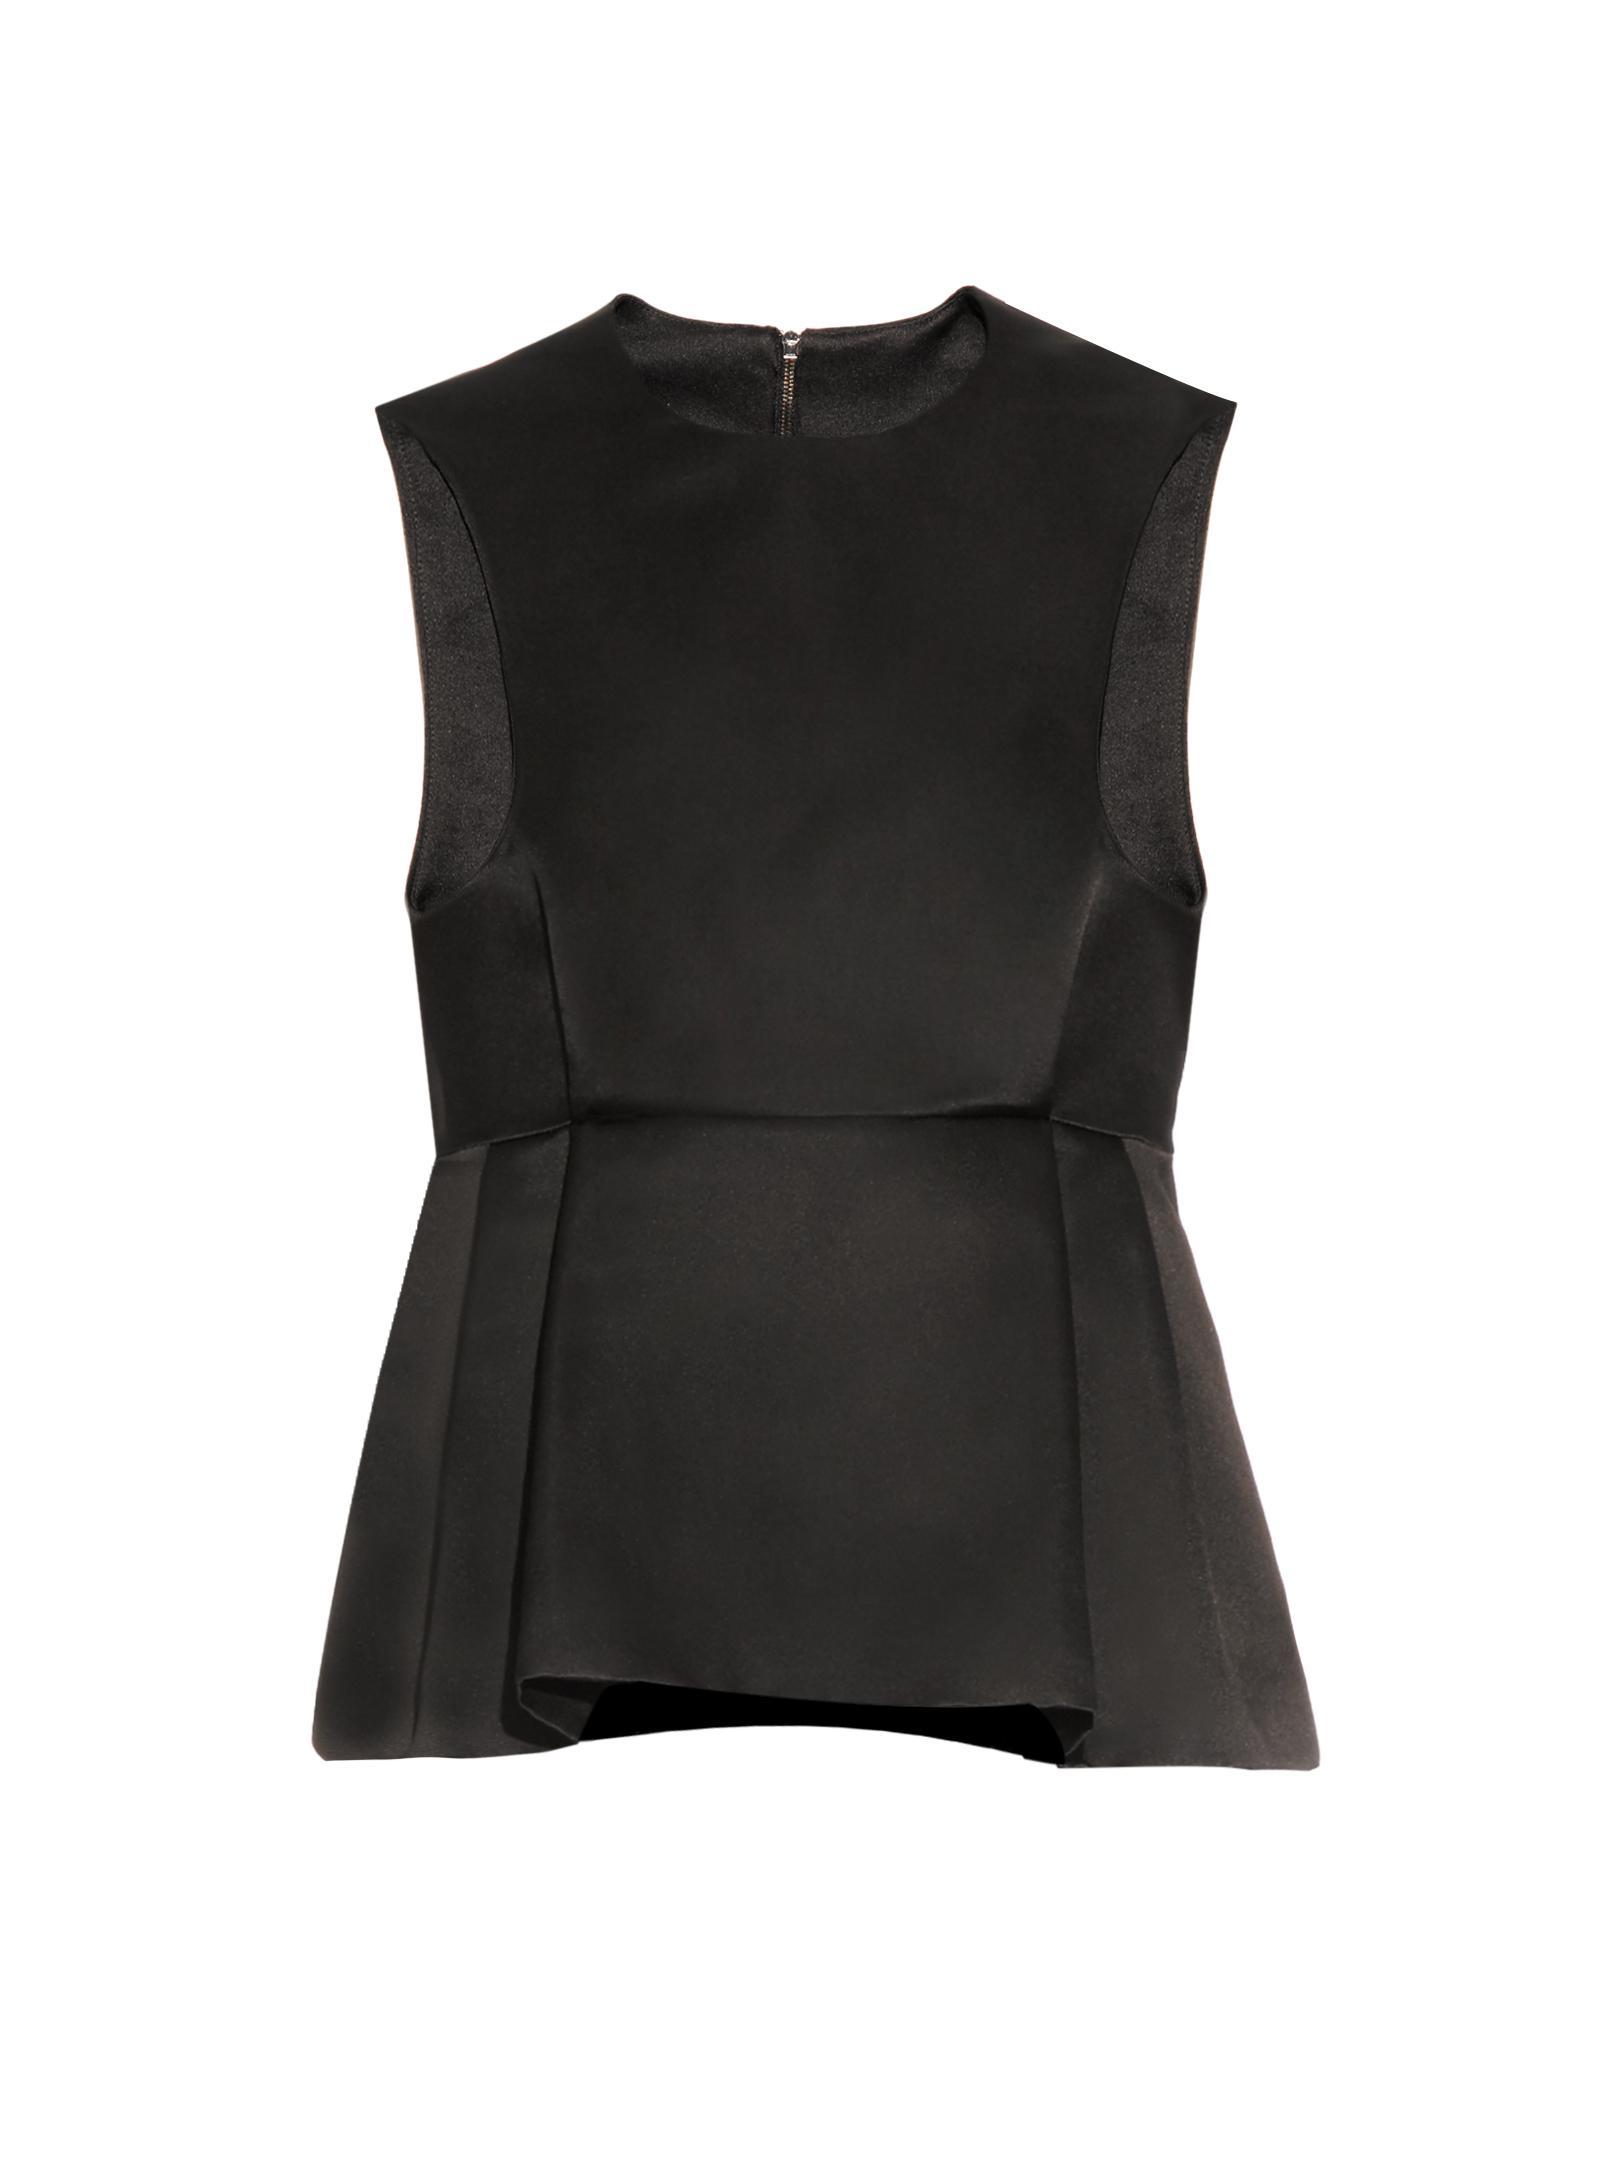 Badydoll duchess silk-satin top Raey Discount Brand New Unisex Cheap Cost Outlet Classic cyRZsCY